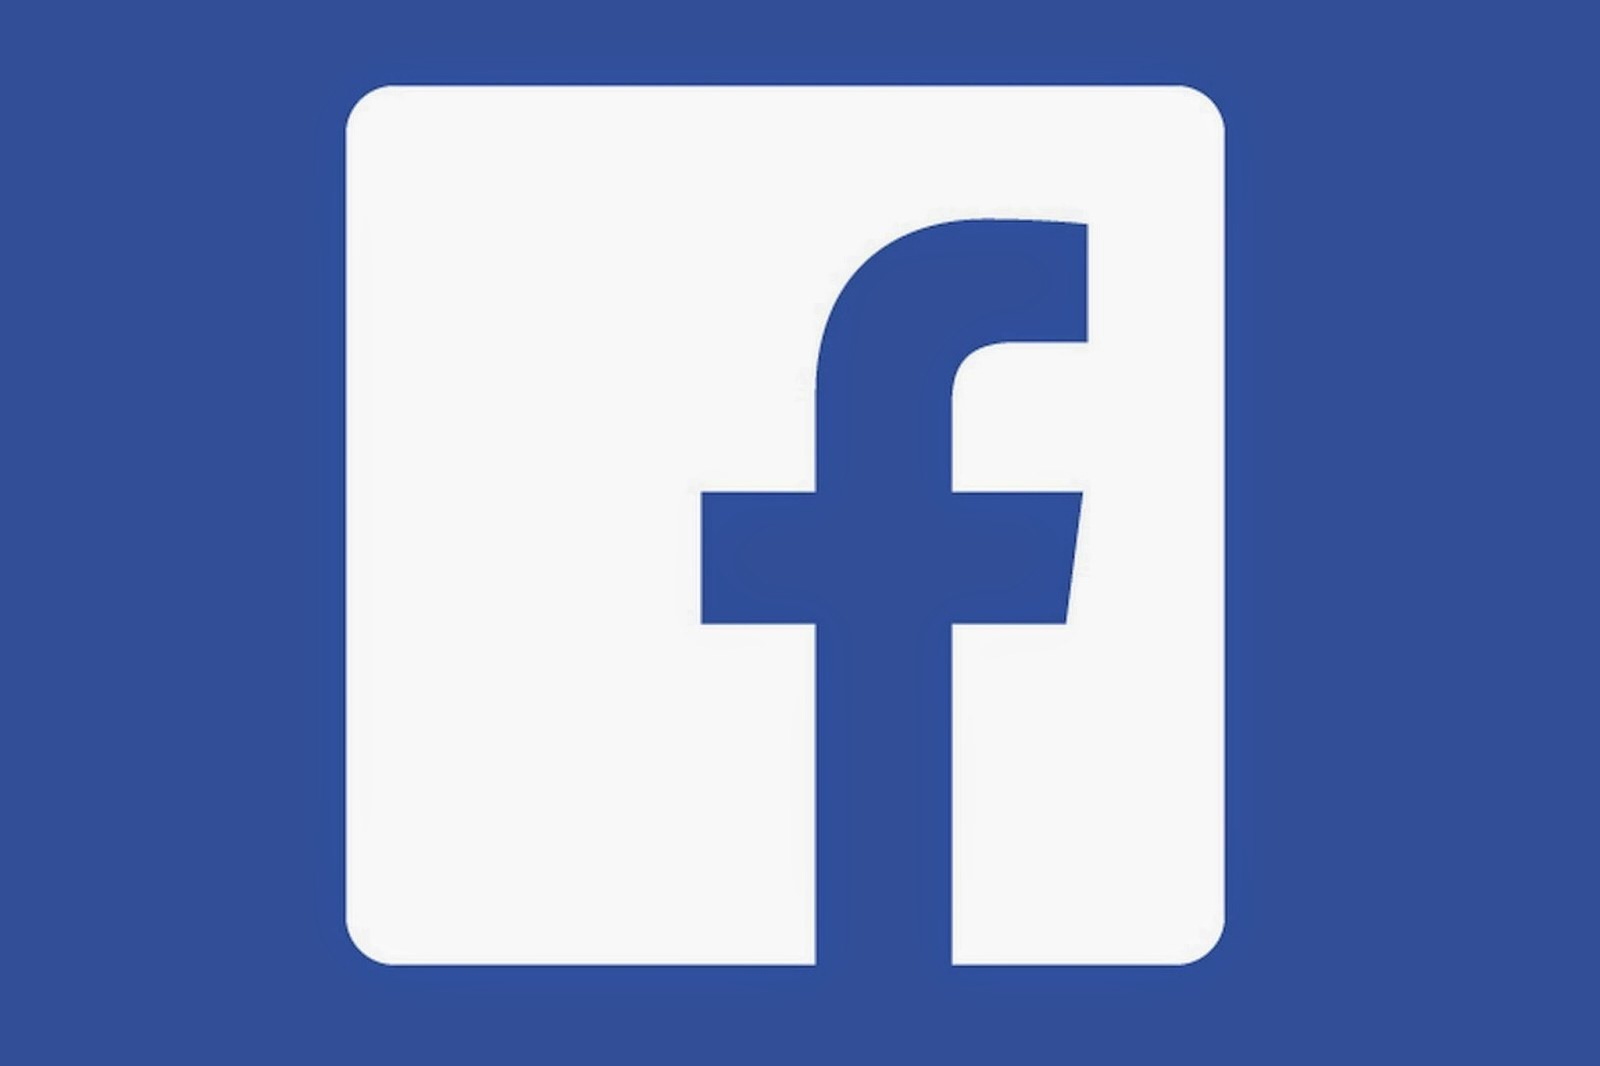 https://www.facebook.com/groups/wcrowing/